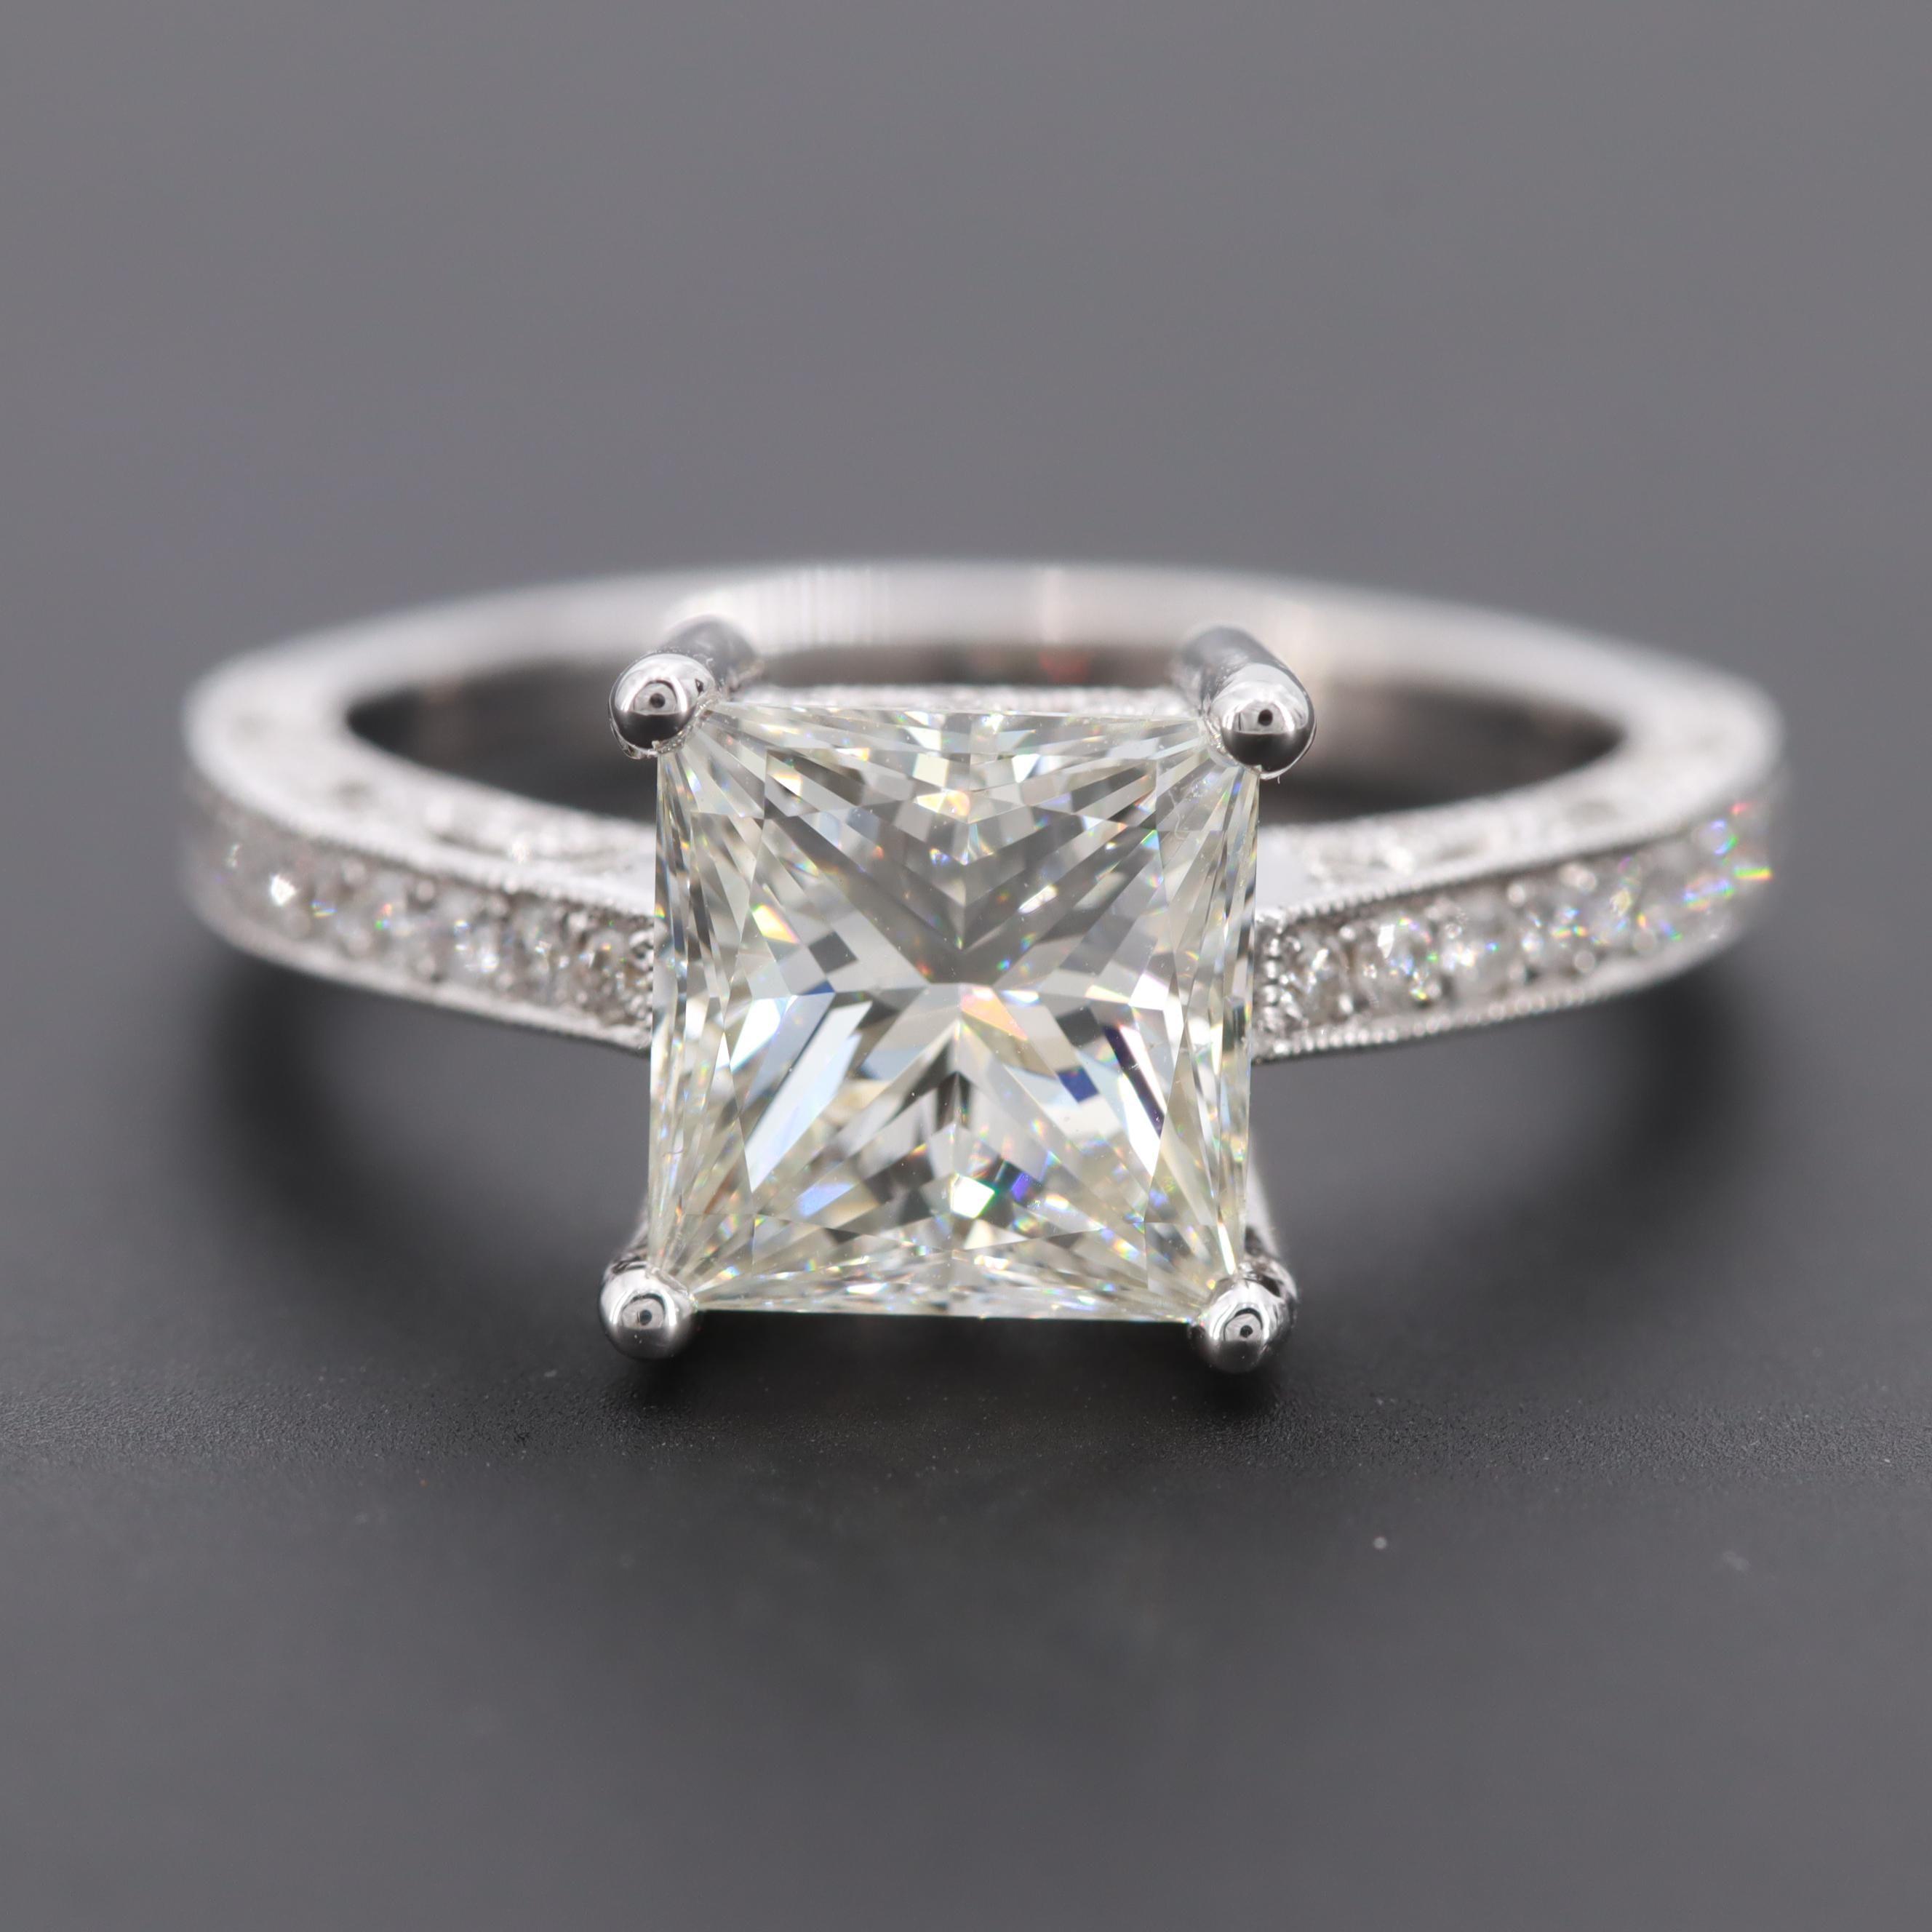 18K White Gold 2.32 CTW Diamond Ring